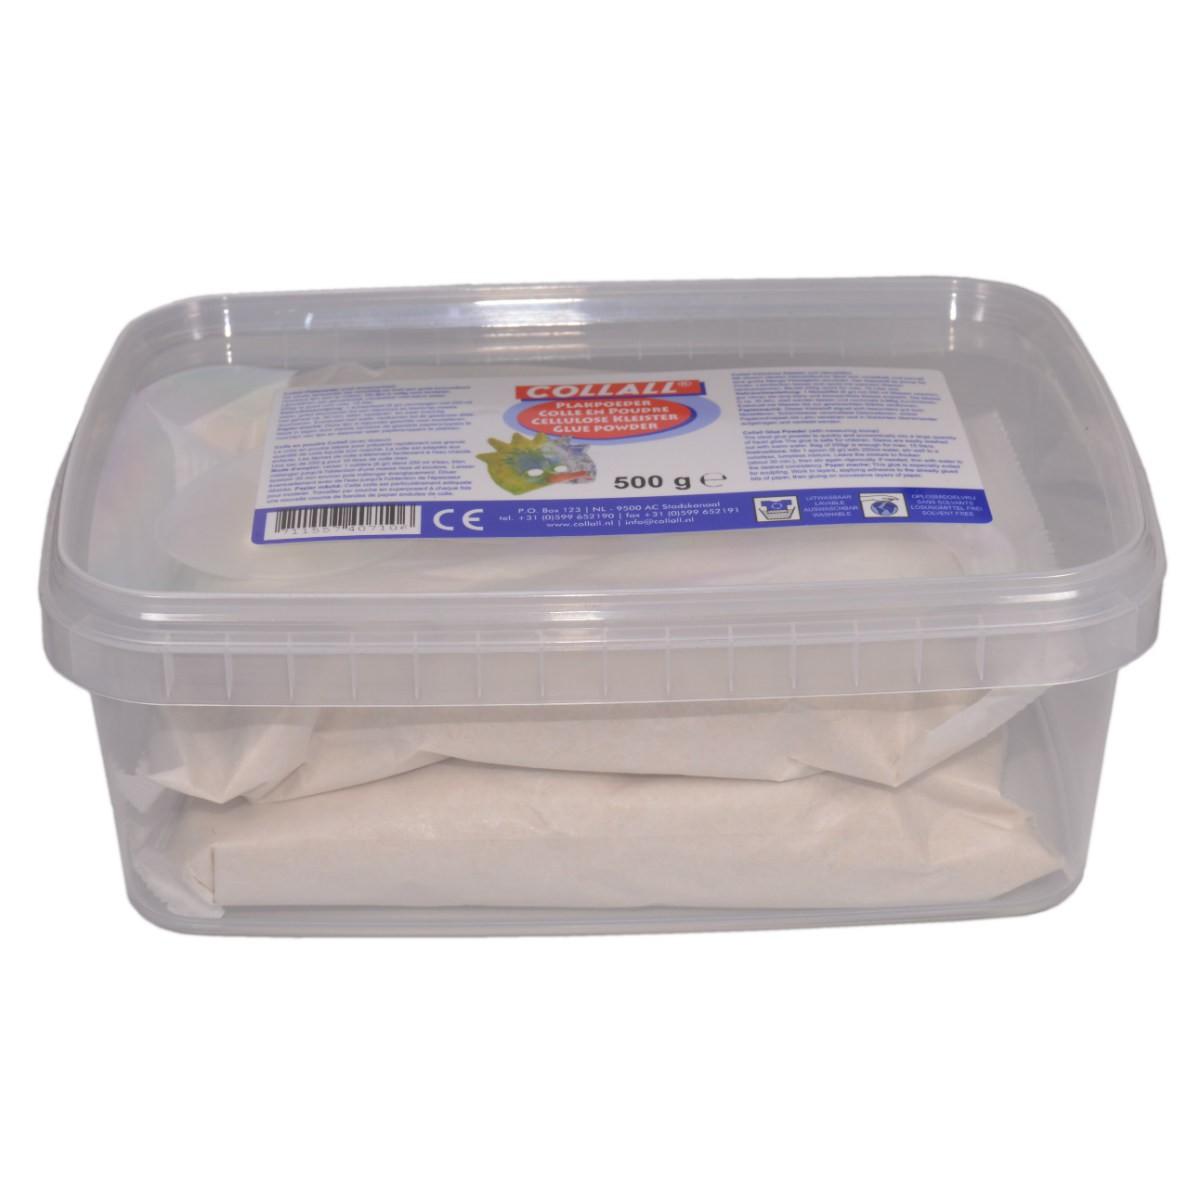 Zellulose Kleber - Cellulose Kleister in Pulverform 500g